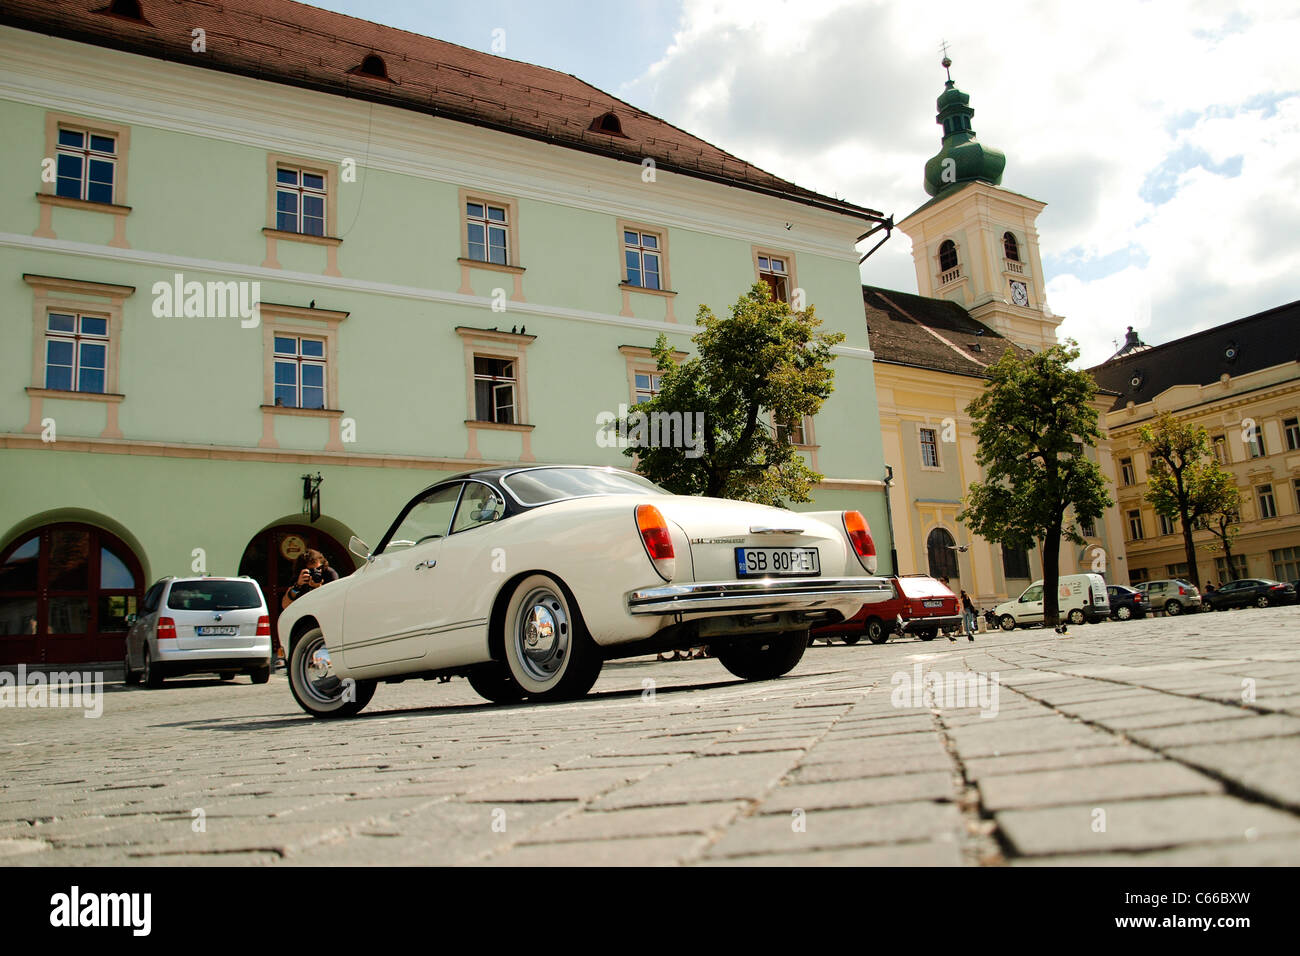 Old car parked inc enter. - Stock Image